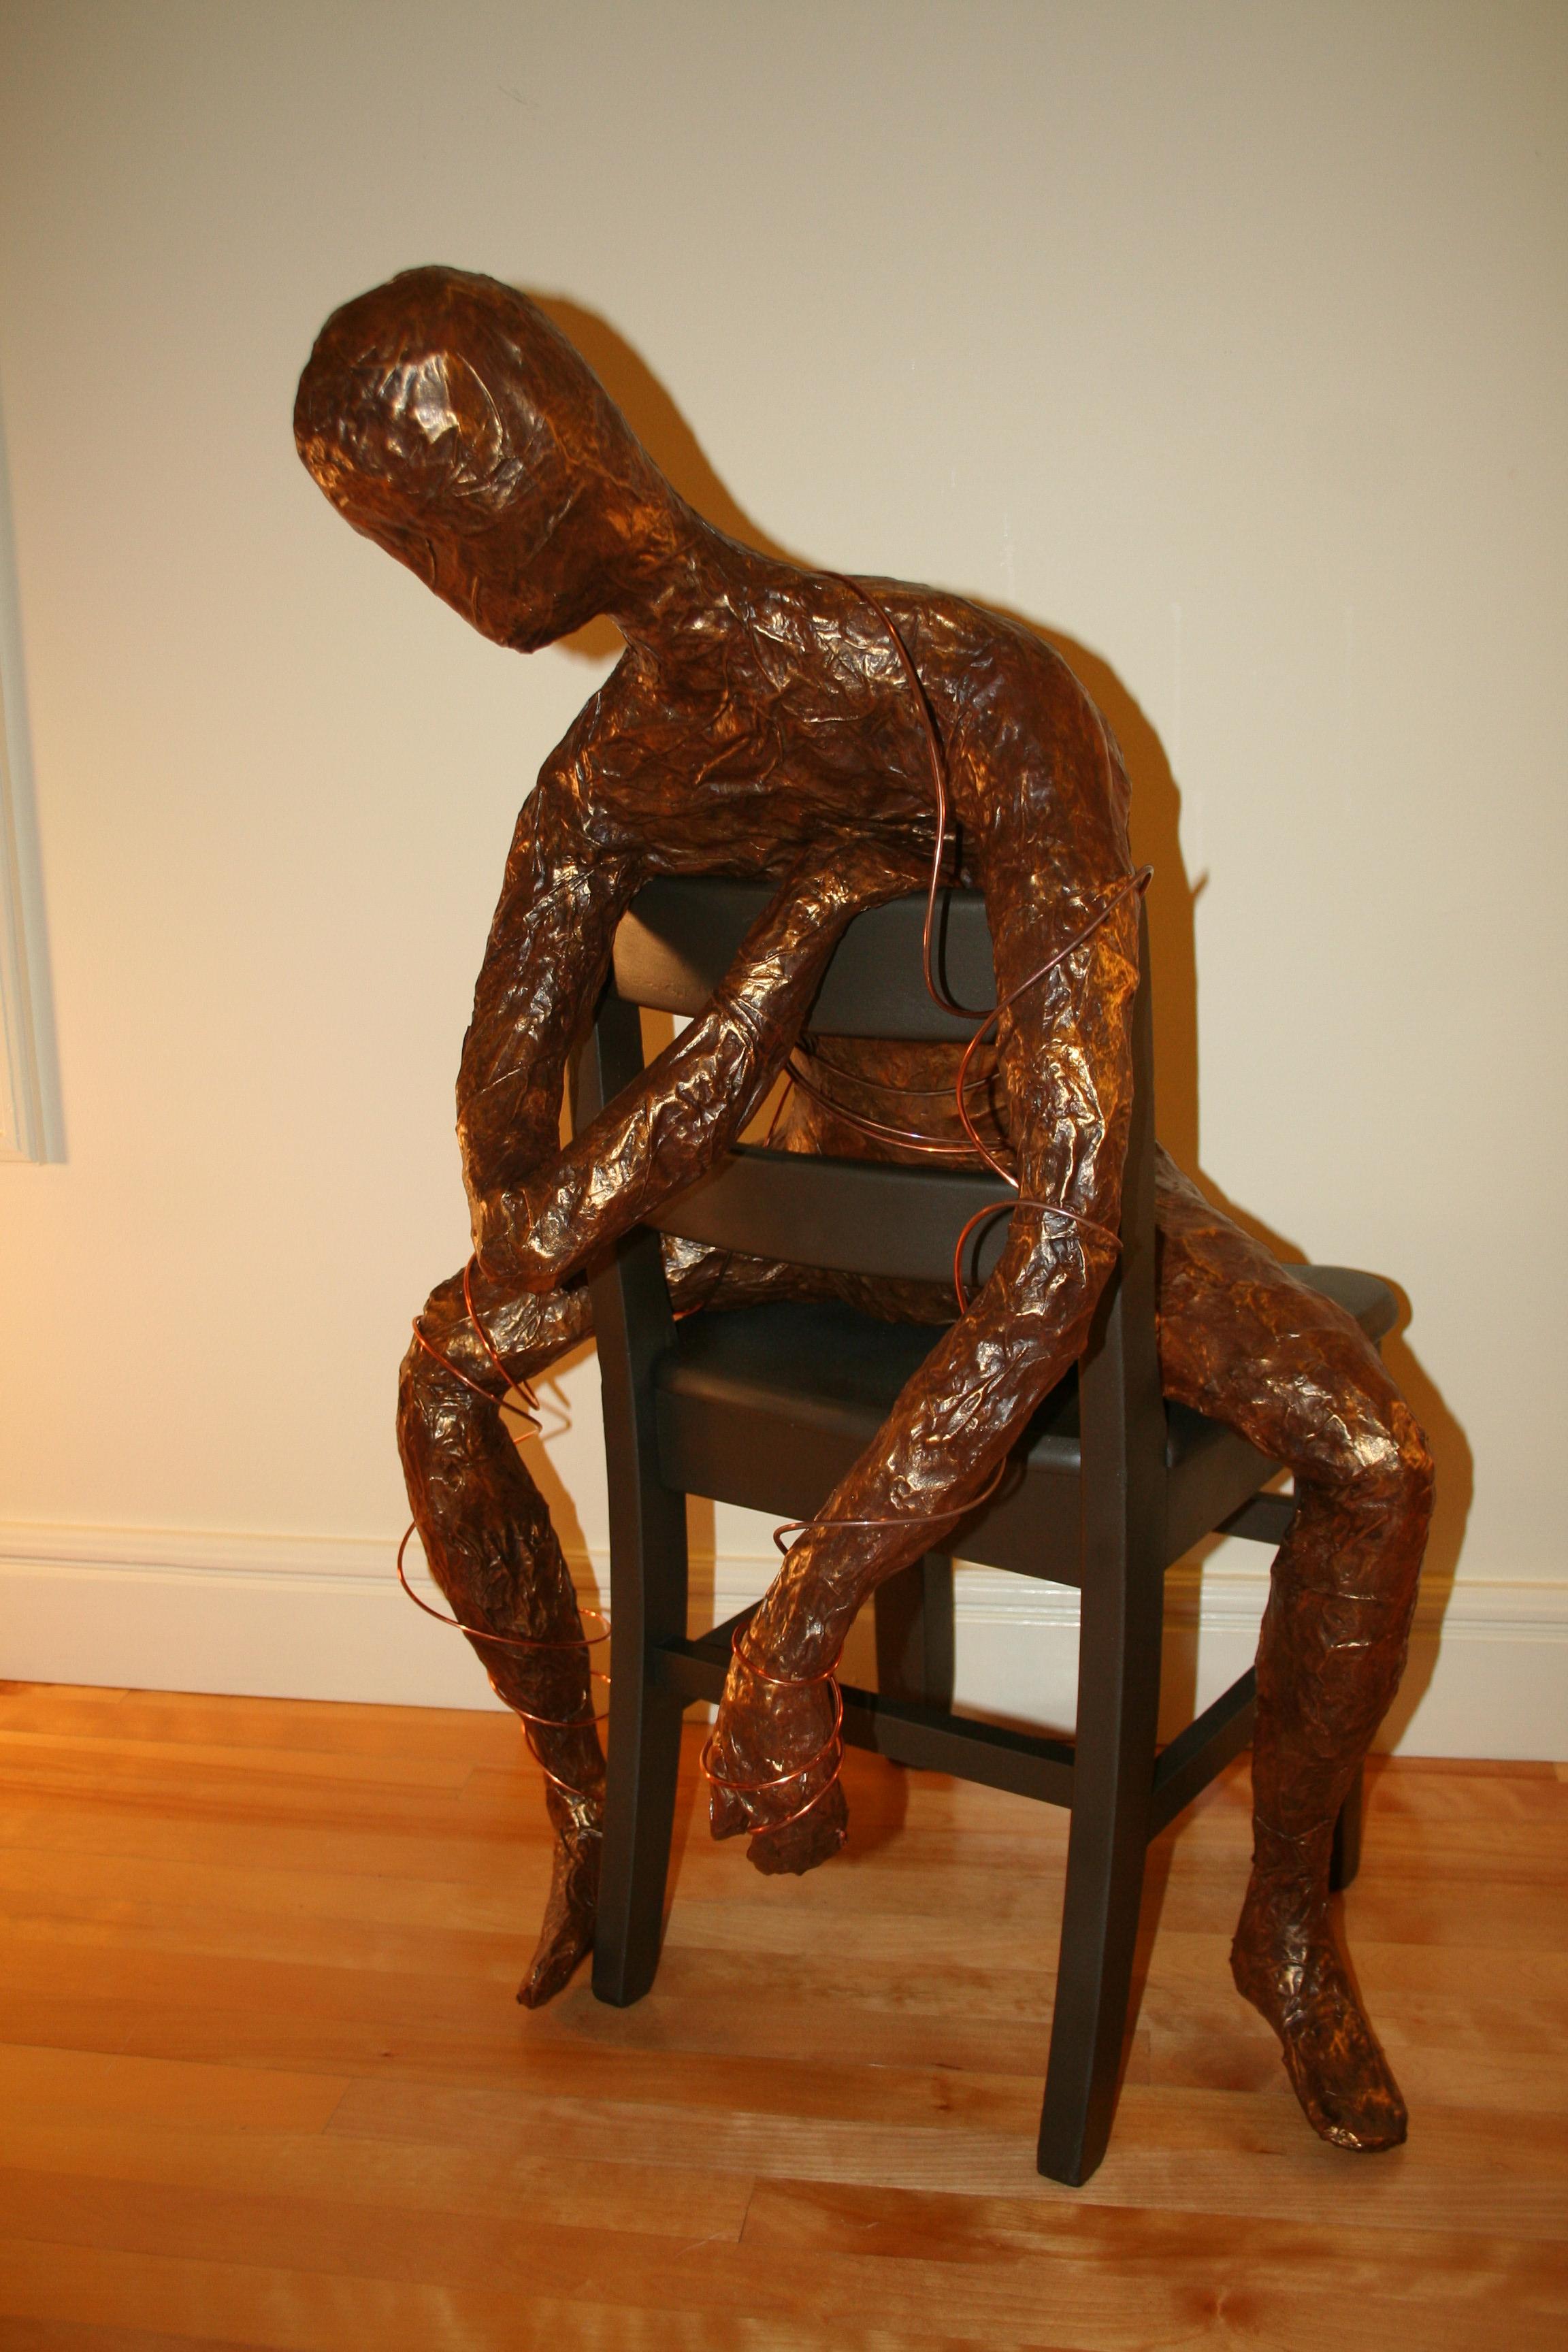 Man on Chair (2).JPG